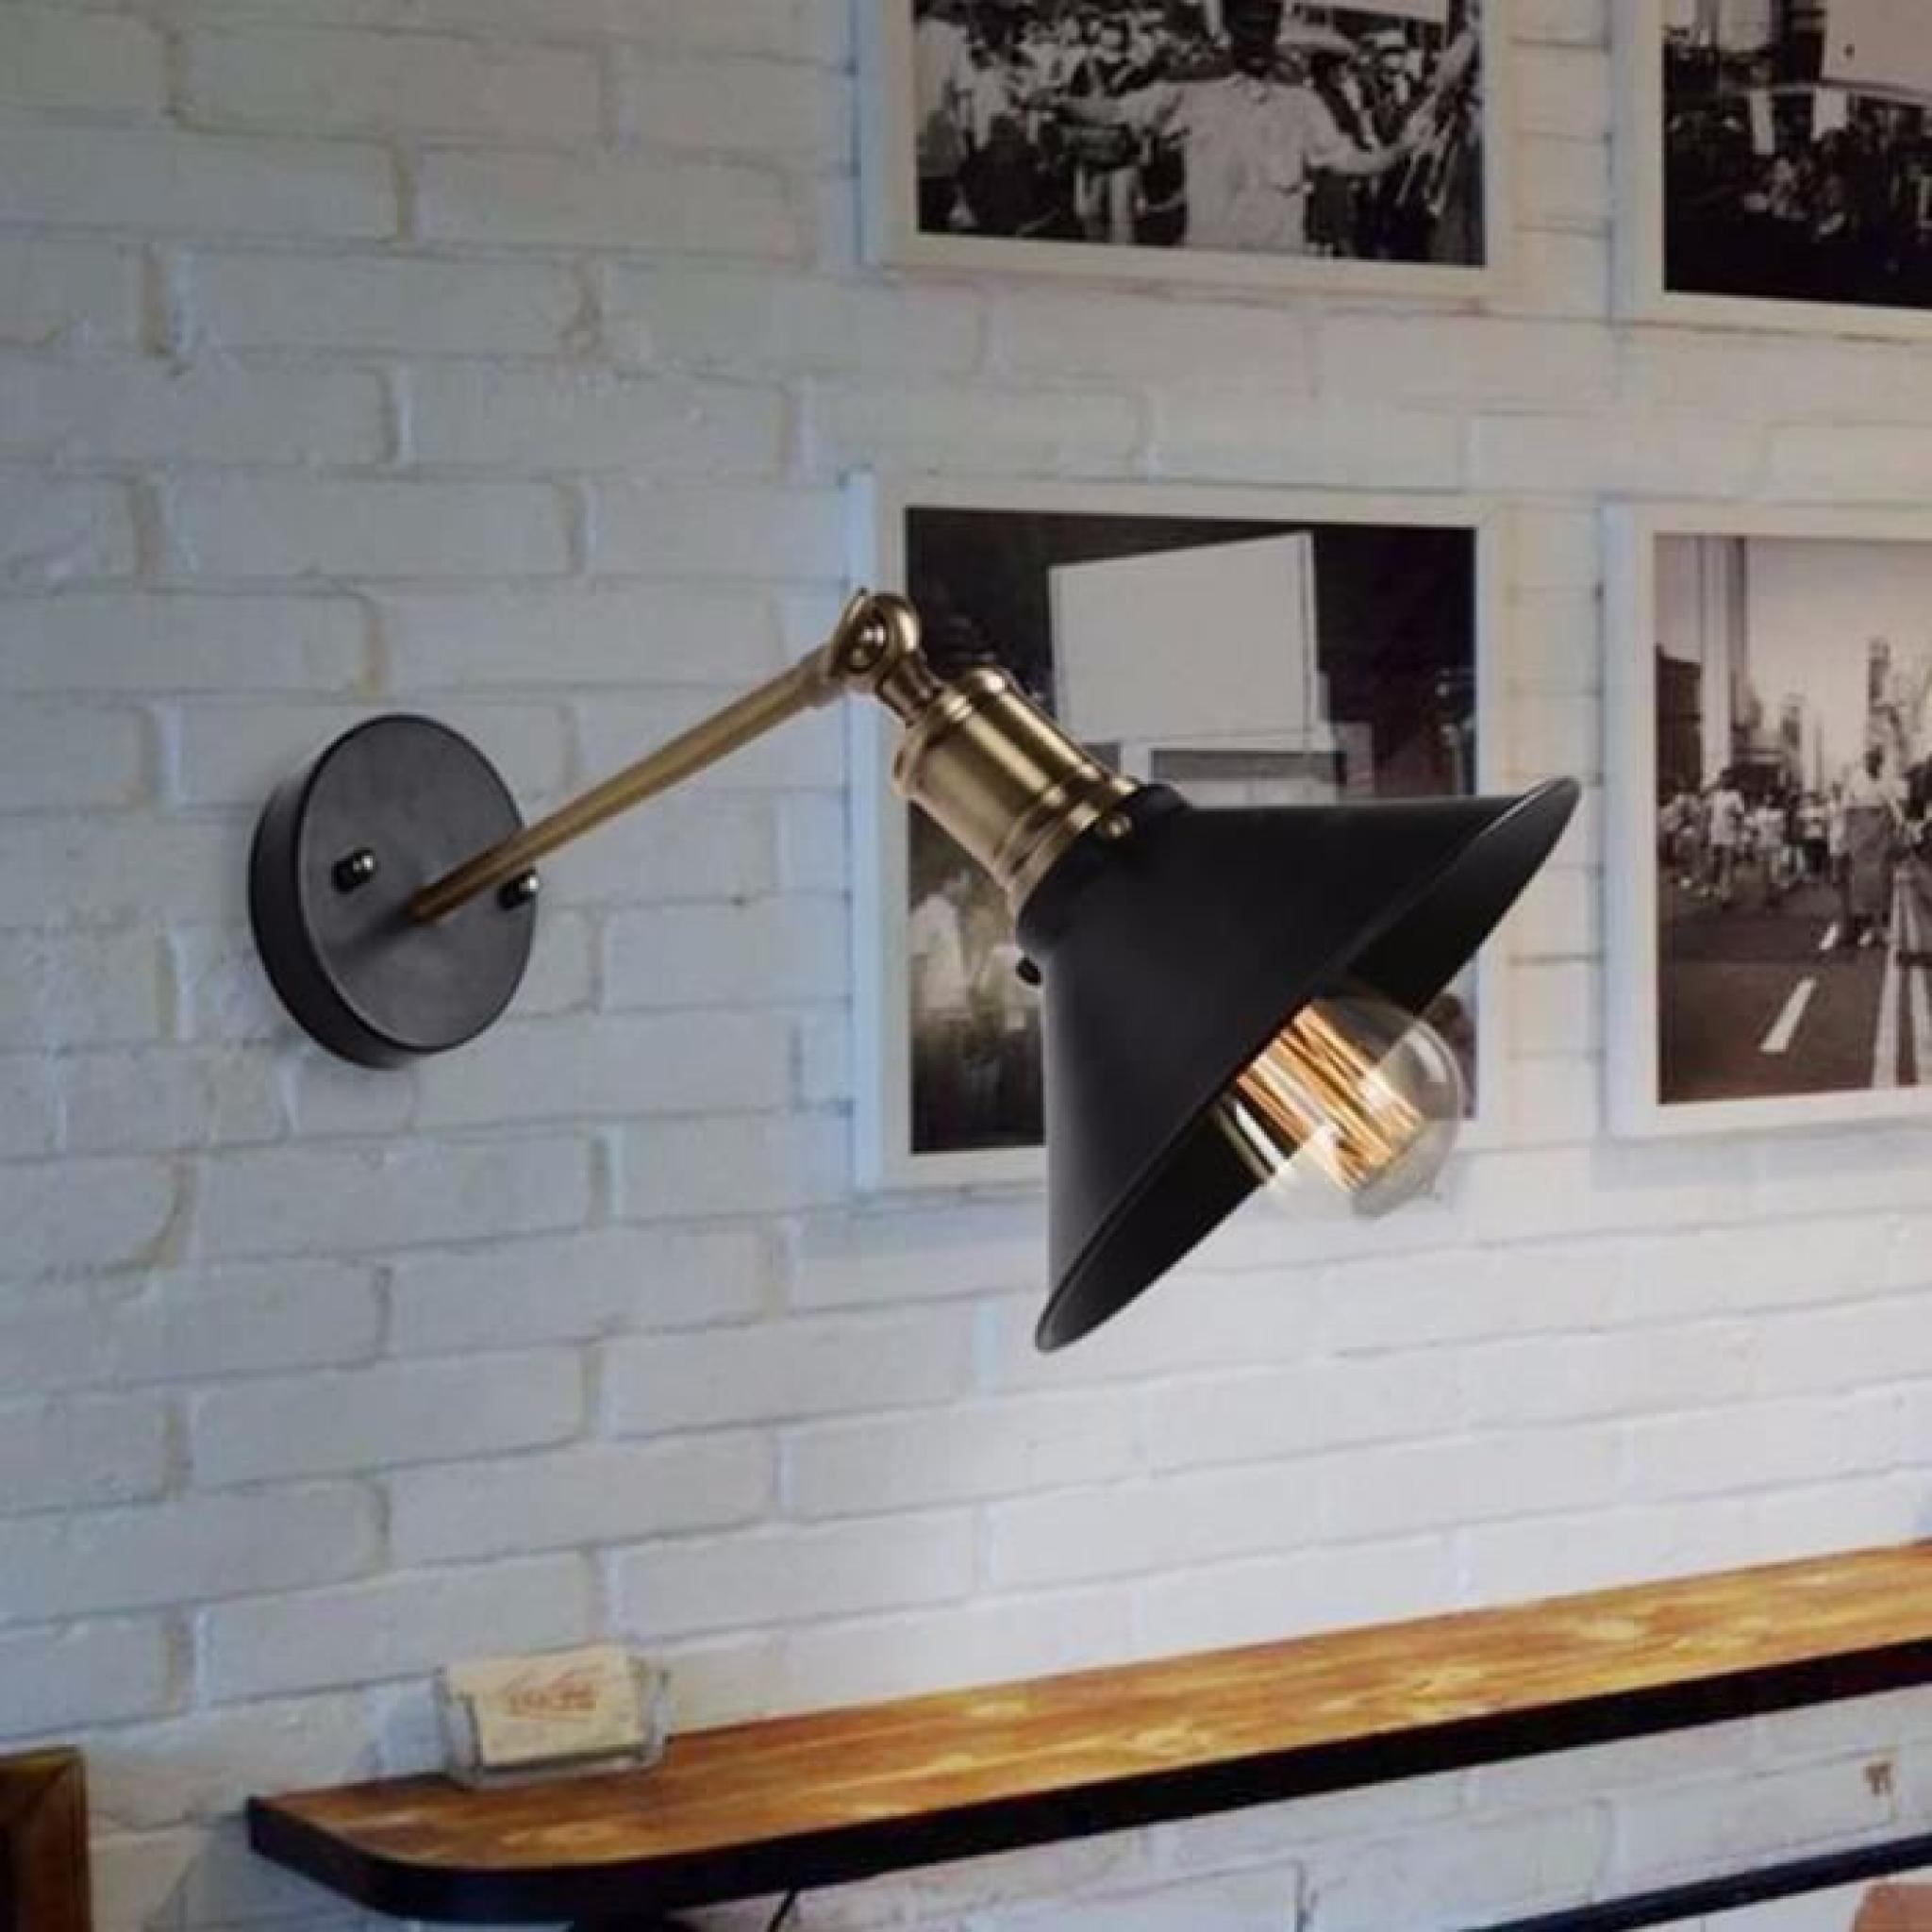 Lampe vintage black metal umbrella loft mur luminaires rétro ...